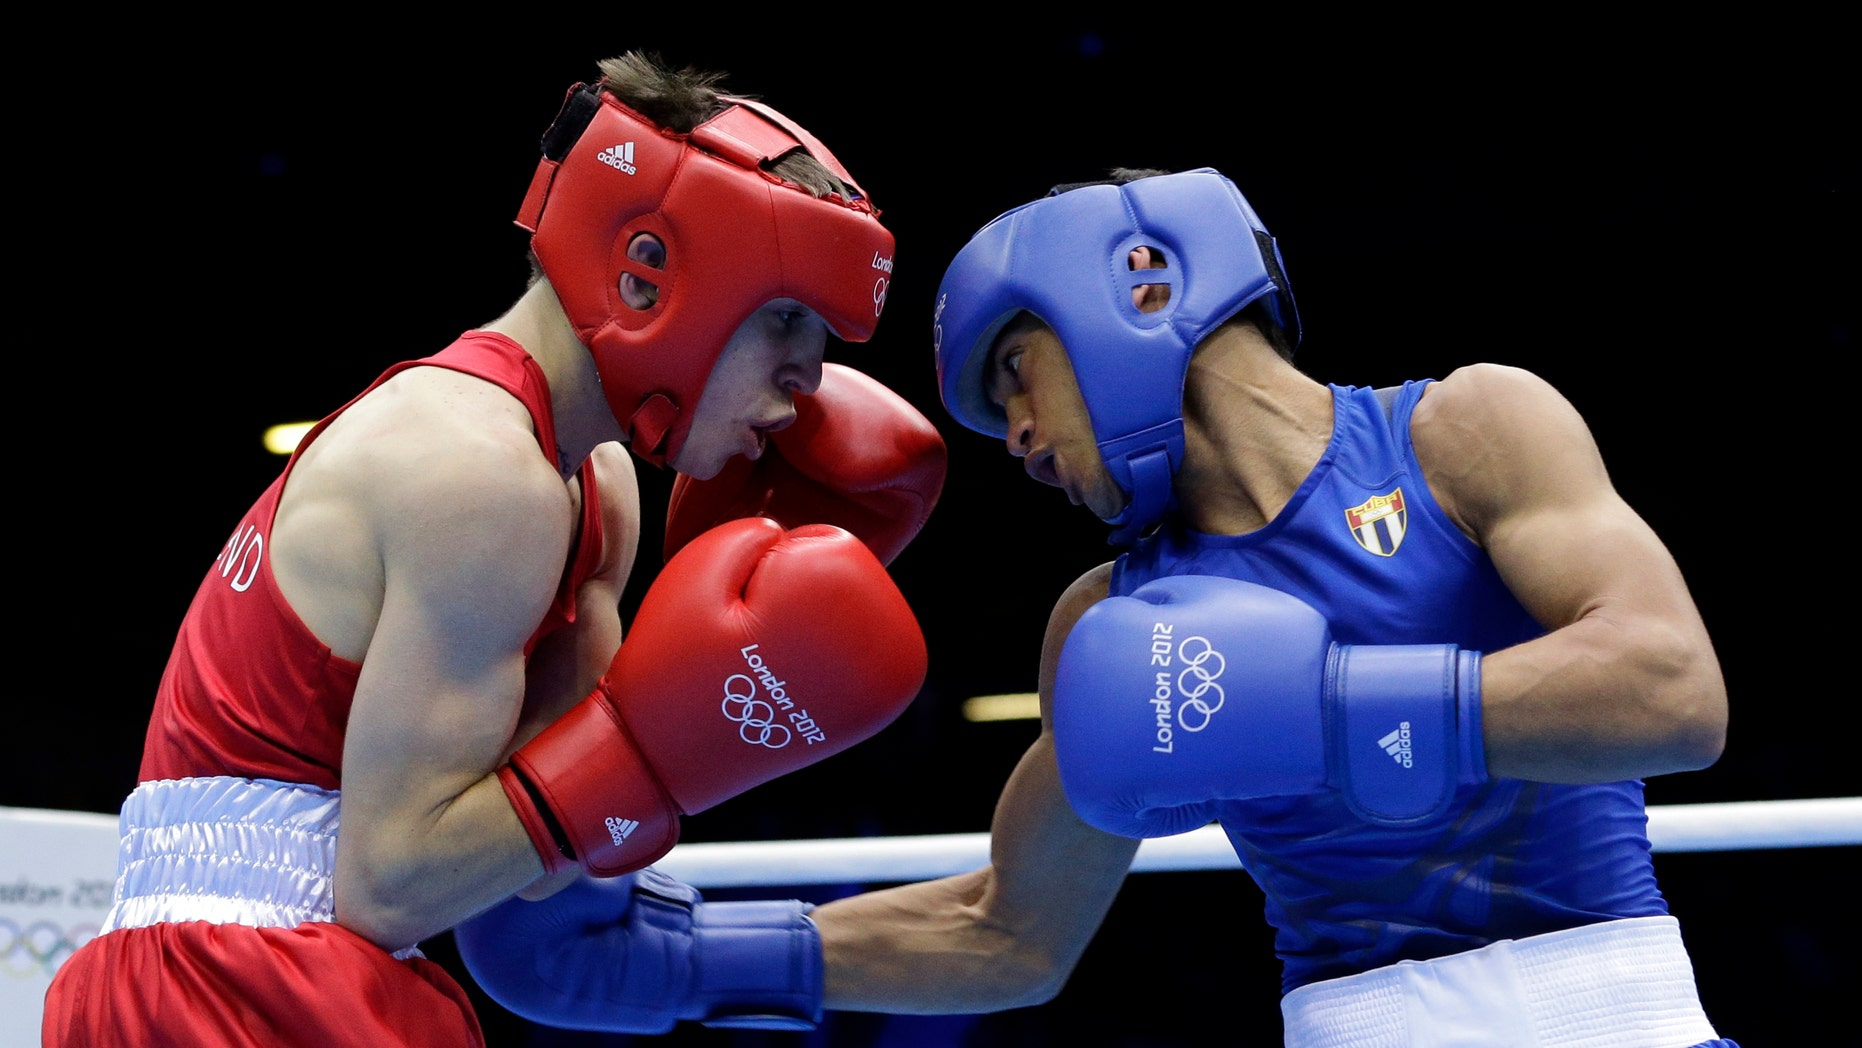 Aug. 10, 2012: Ireland's Michael Conlan, left, fights Cuba's Robeisy Ramirez Carrazana in a flyweight 52-kg semifinal boxing match at the 2012 Summer Olympics, Friday, in London.